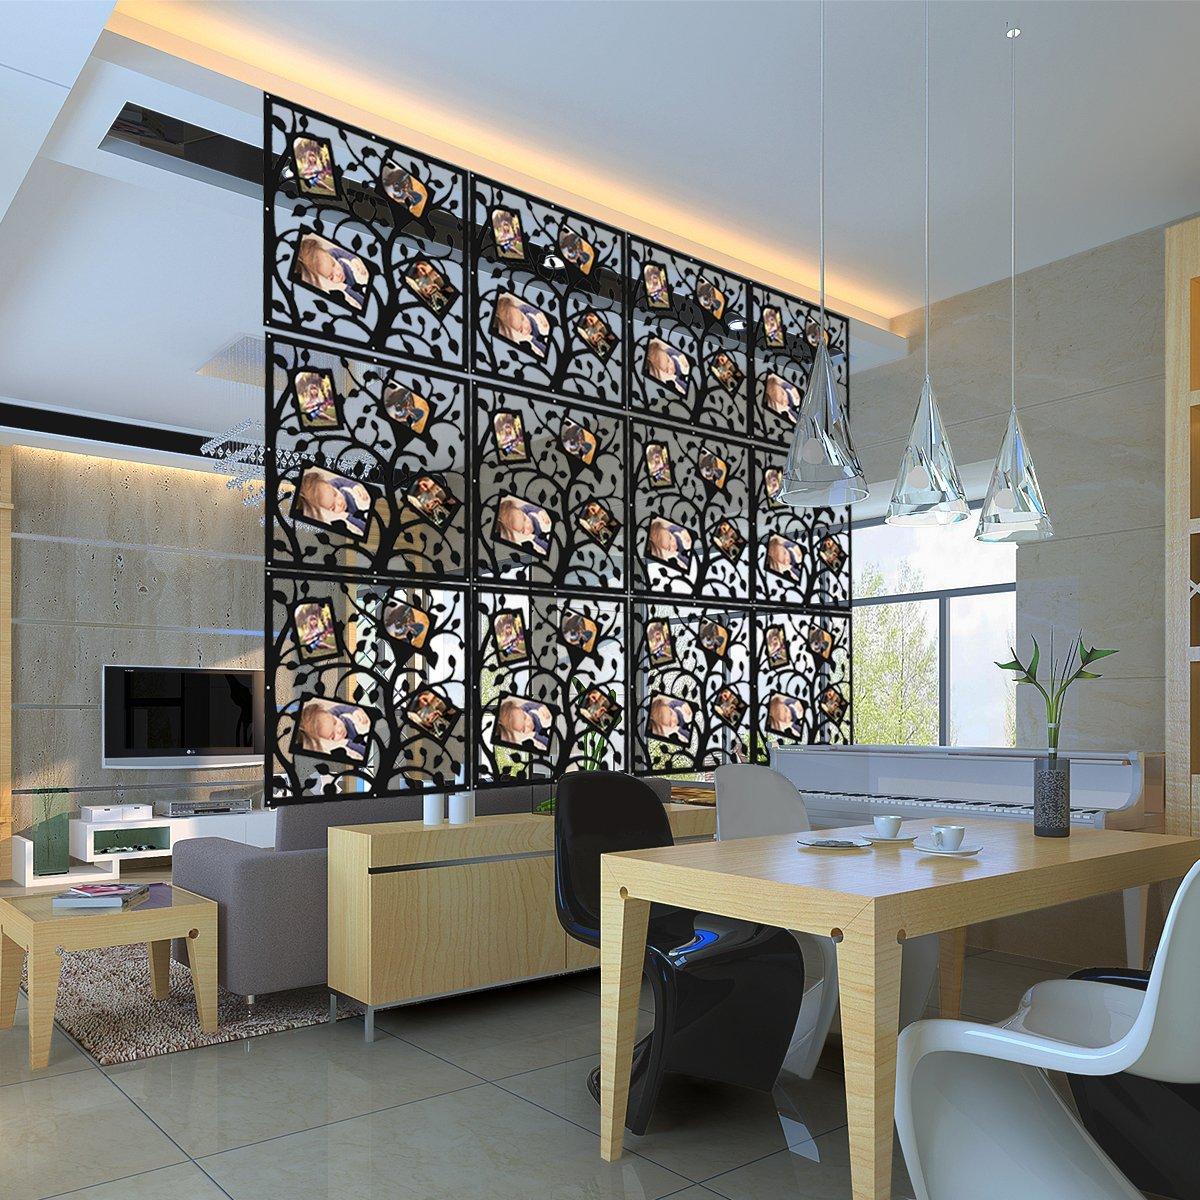 9be2925ad26 Buy Kernorv DIY Room Divider Partitions Separator Hanging Decorative ...